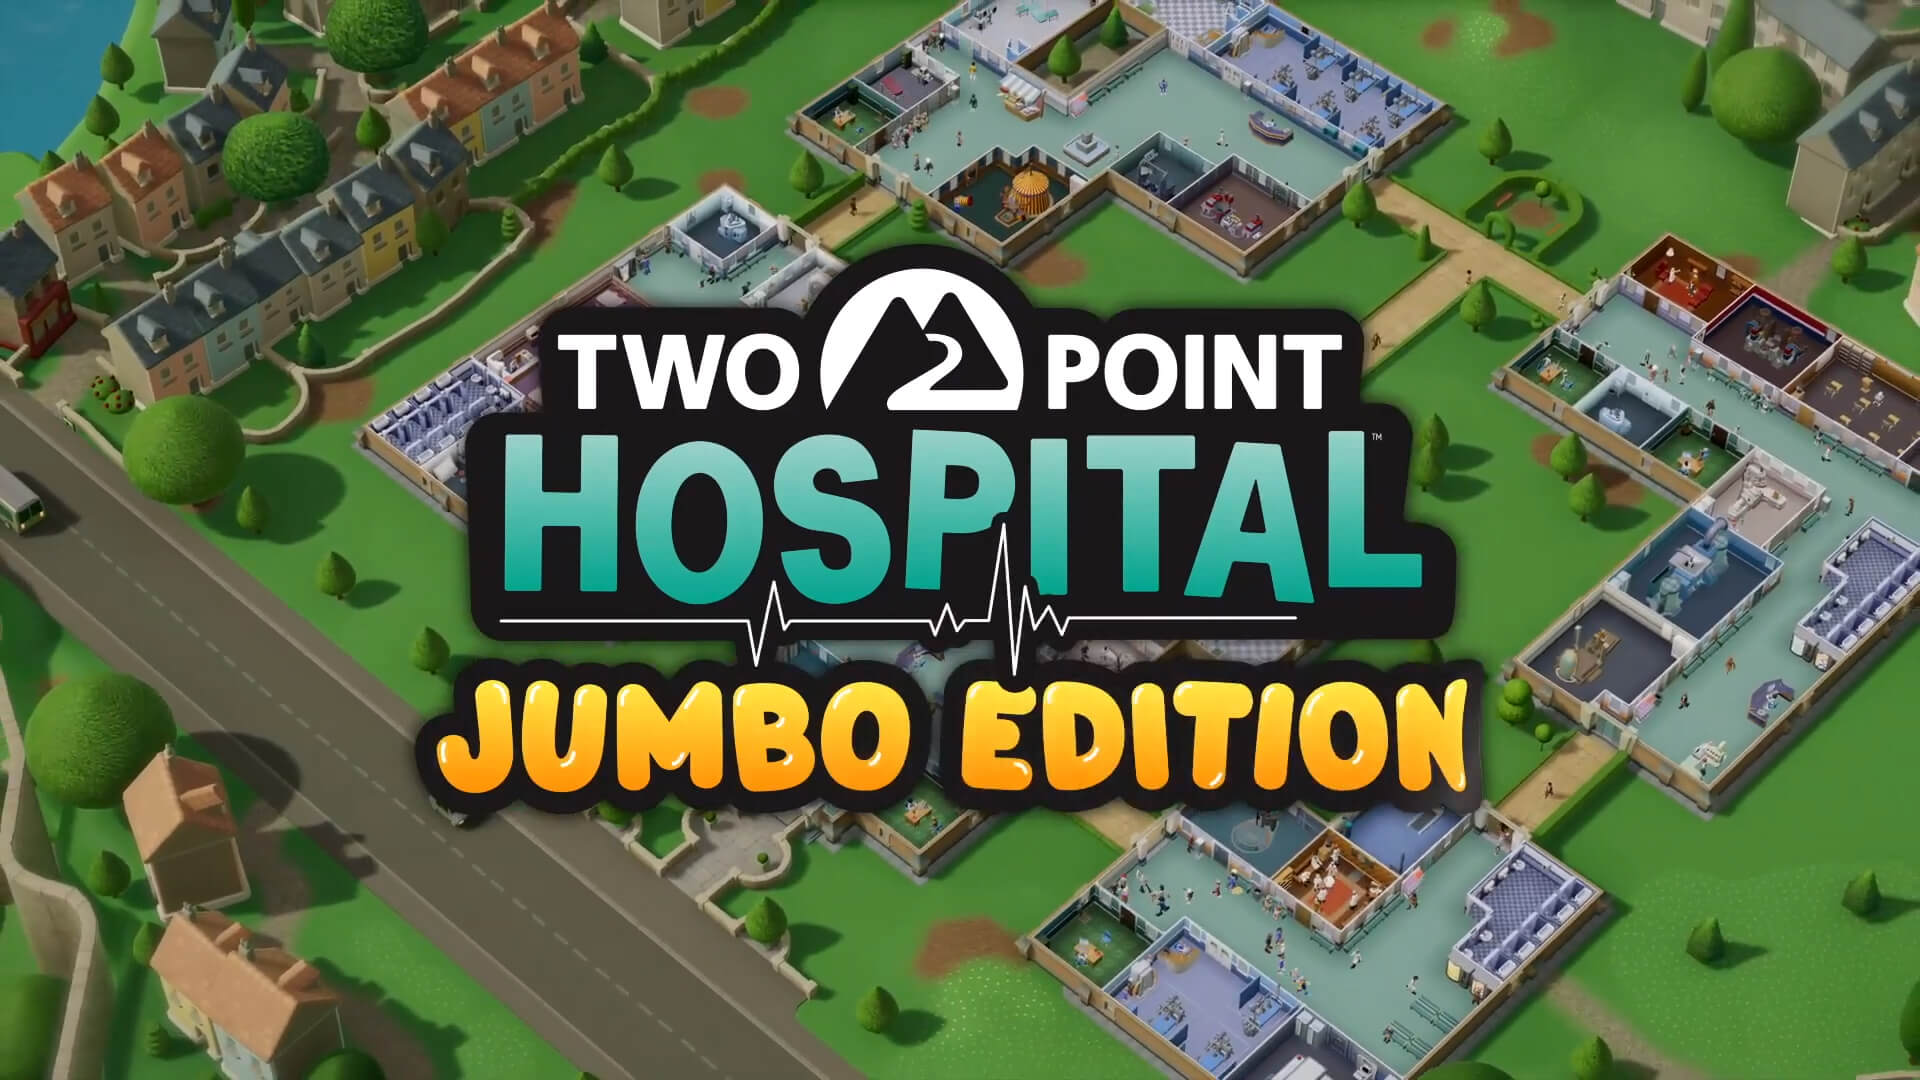 Two Point Hospital JUMBO Edition NintendOn